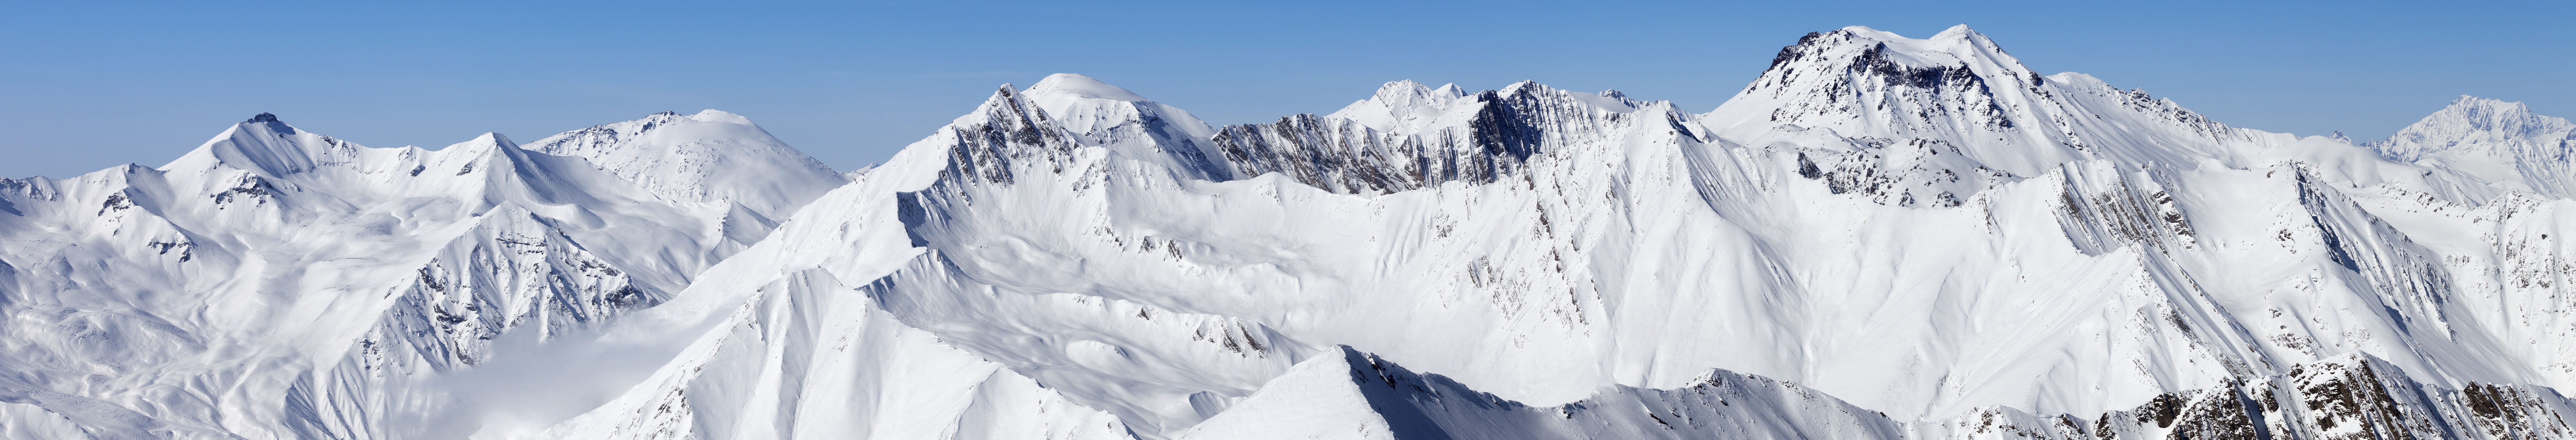 Panorama of snowy mountain peaks